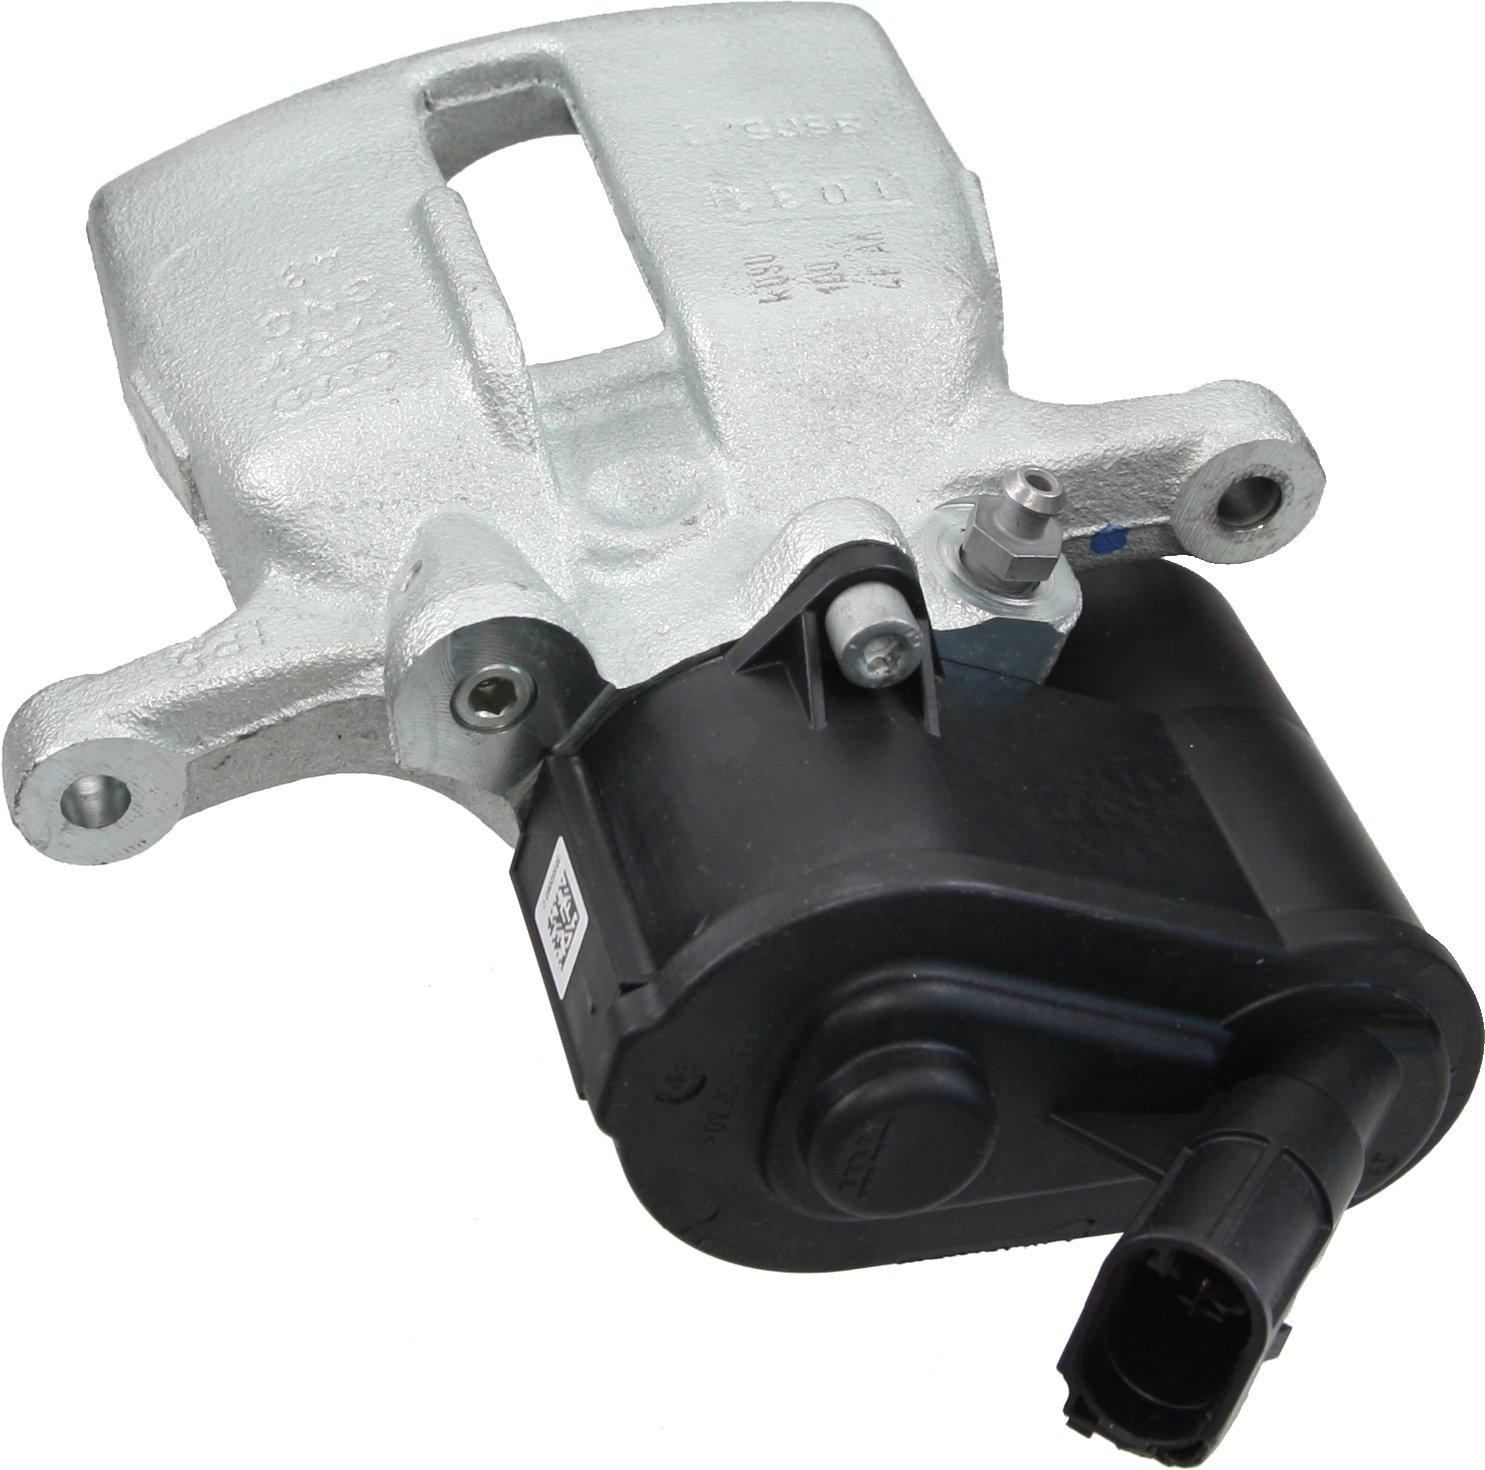 ABS 522891 Pinza del freno ABS All Brake Systems bv